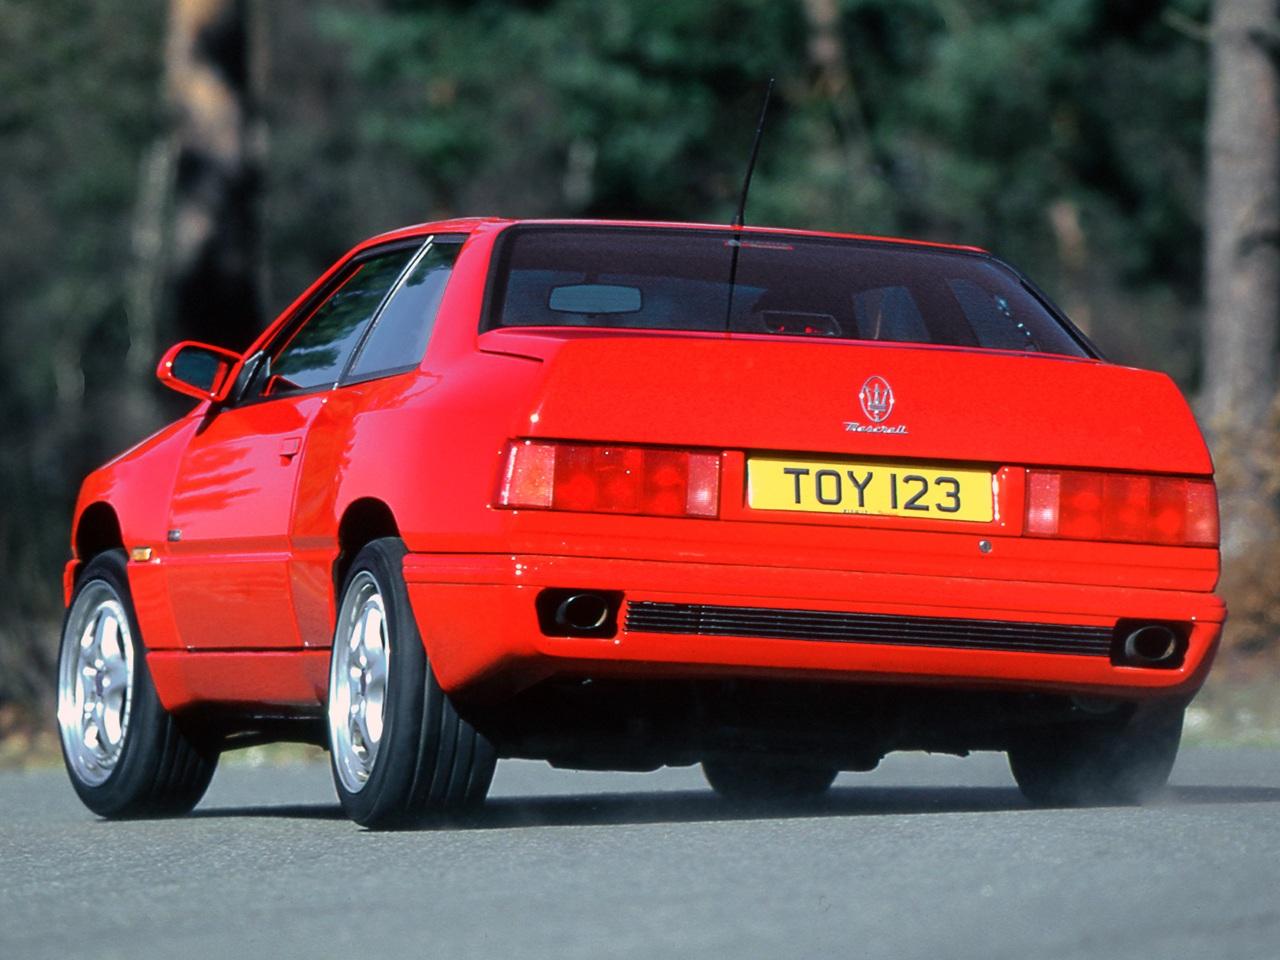 Coche del día: Maserati Ghibli 2.8 V6 (AM336)   espíritu RACER